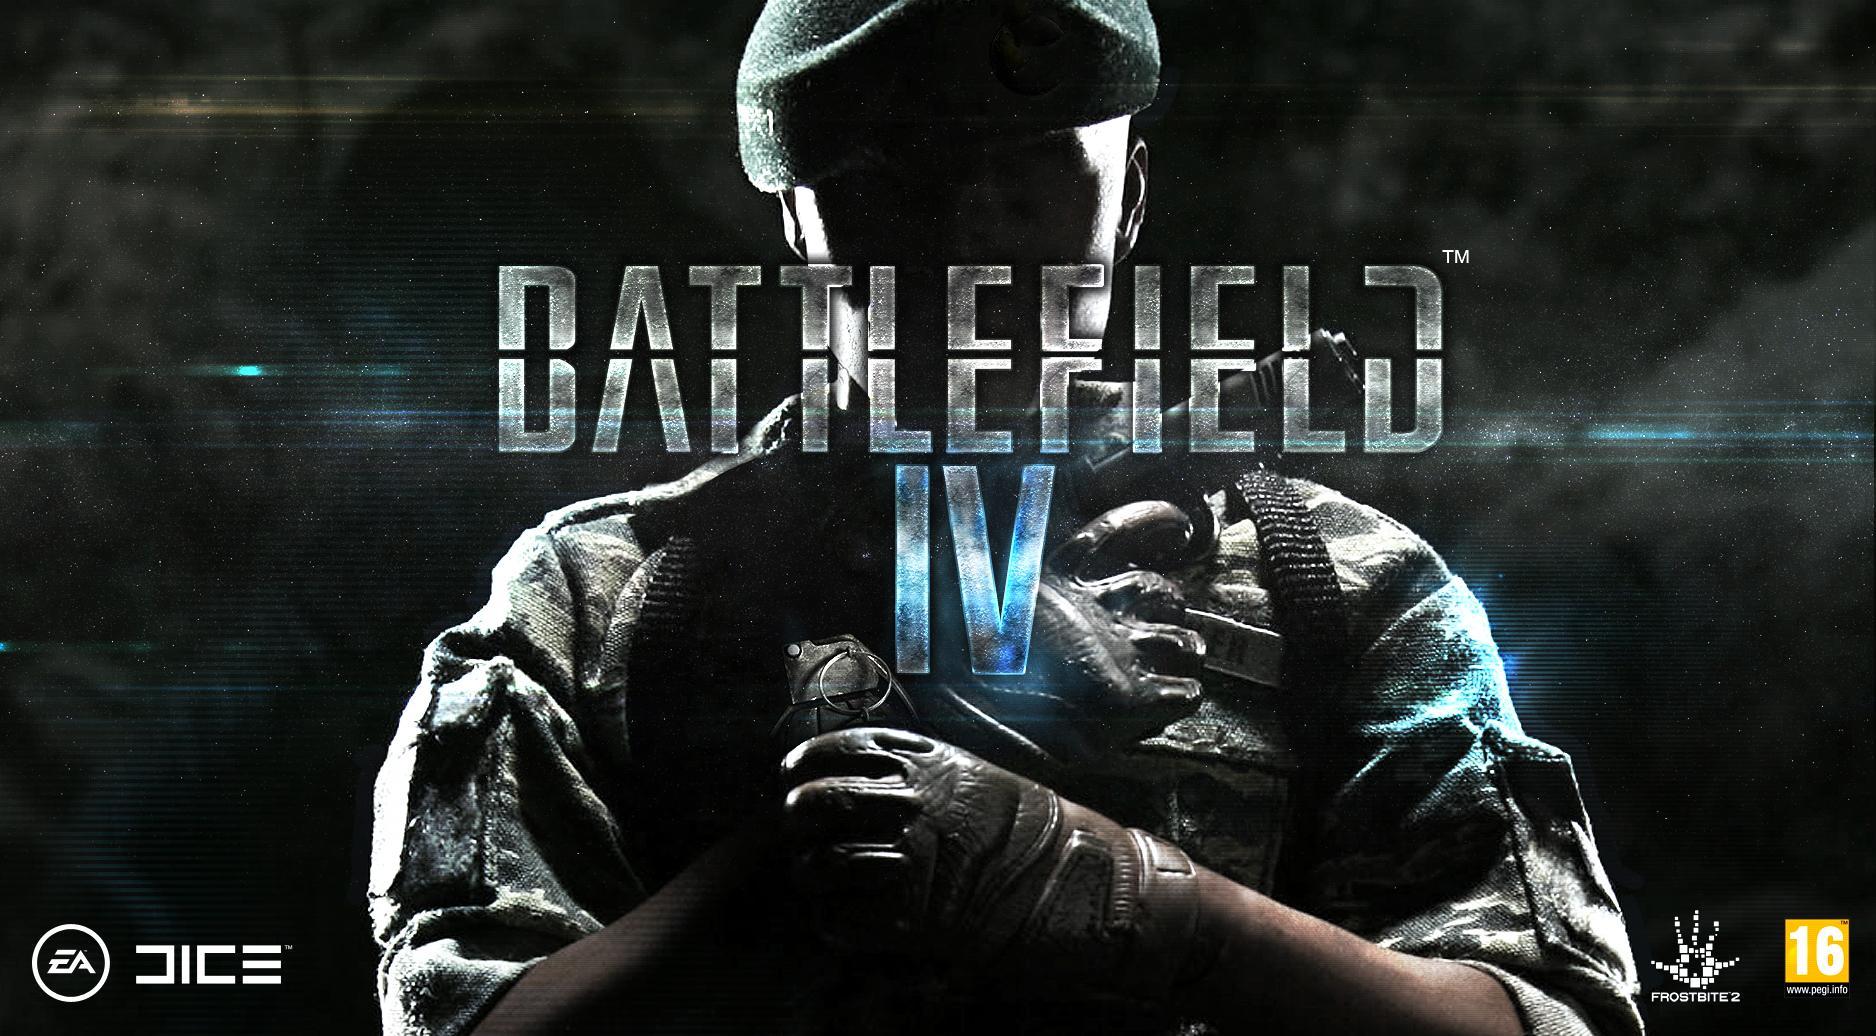 Acheter Battlefield 4, Battlefield 4 cd key